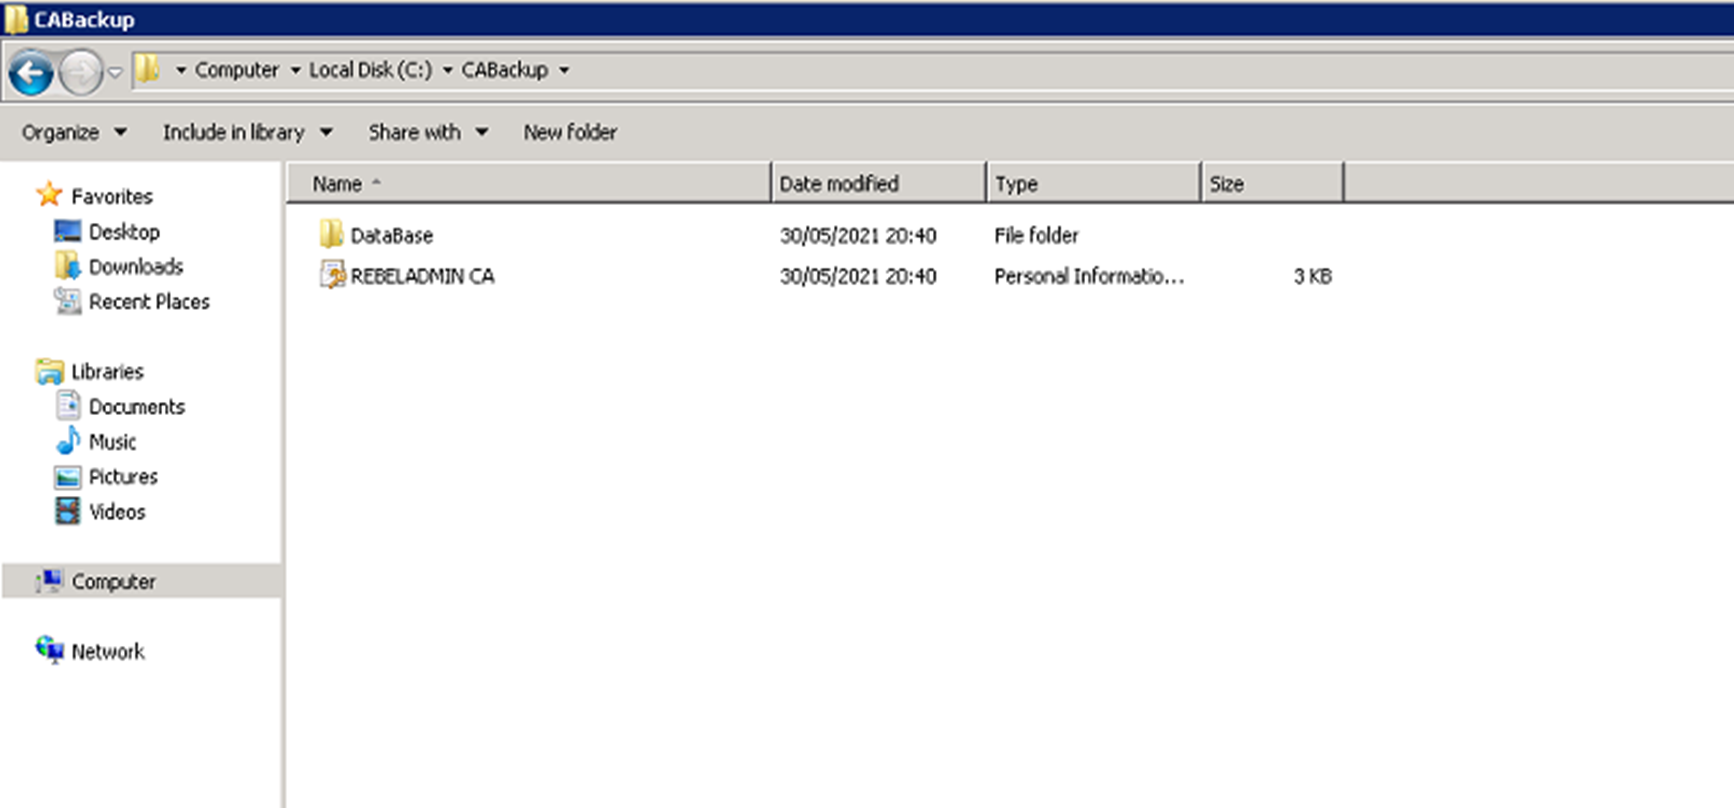 Windows Server 2008 R2 CA Backup Content